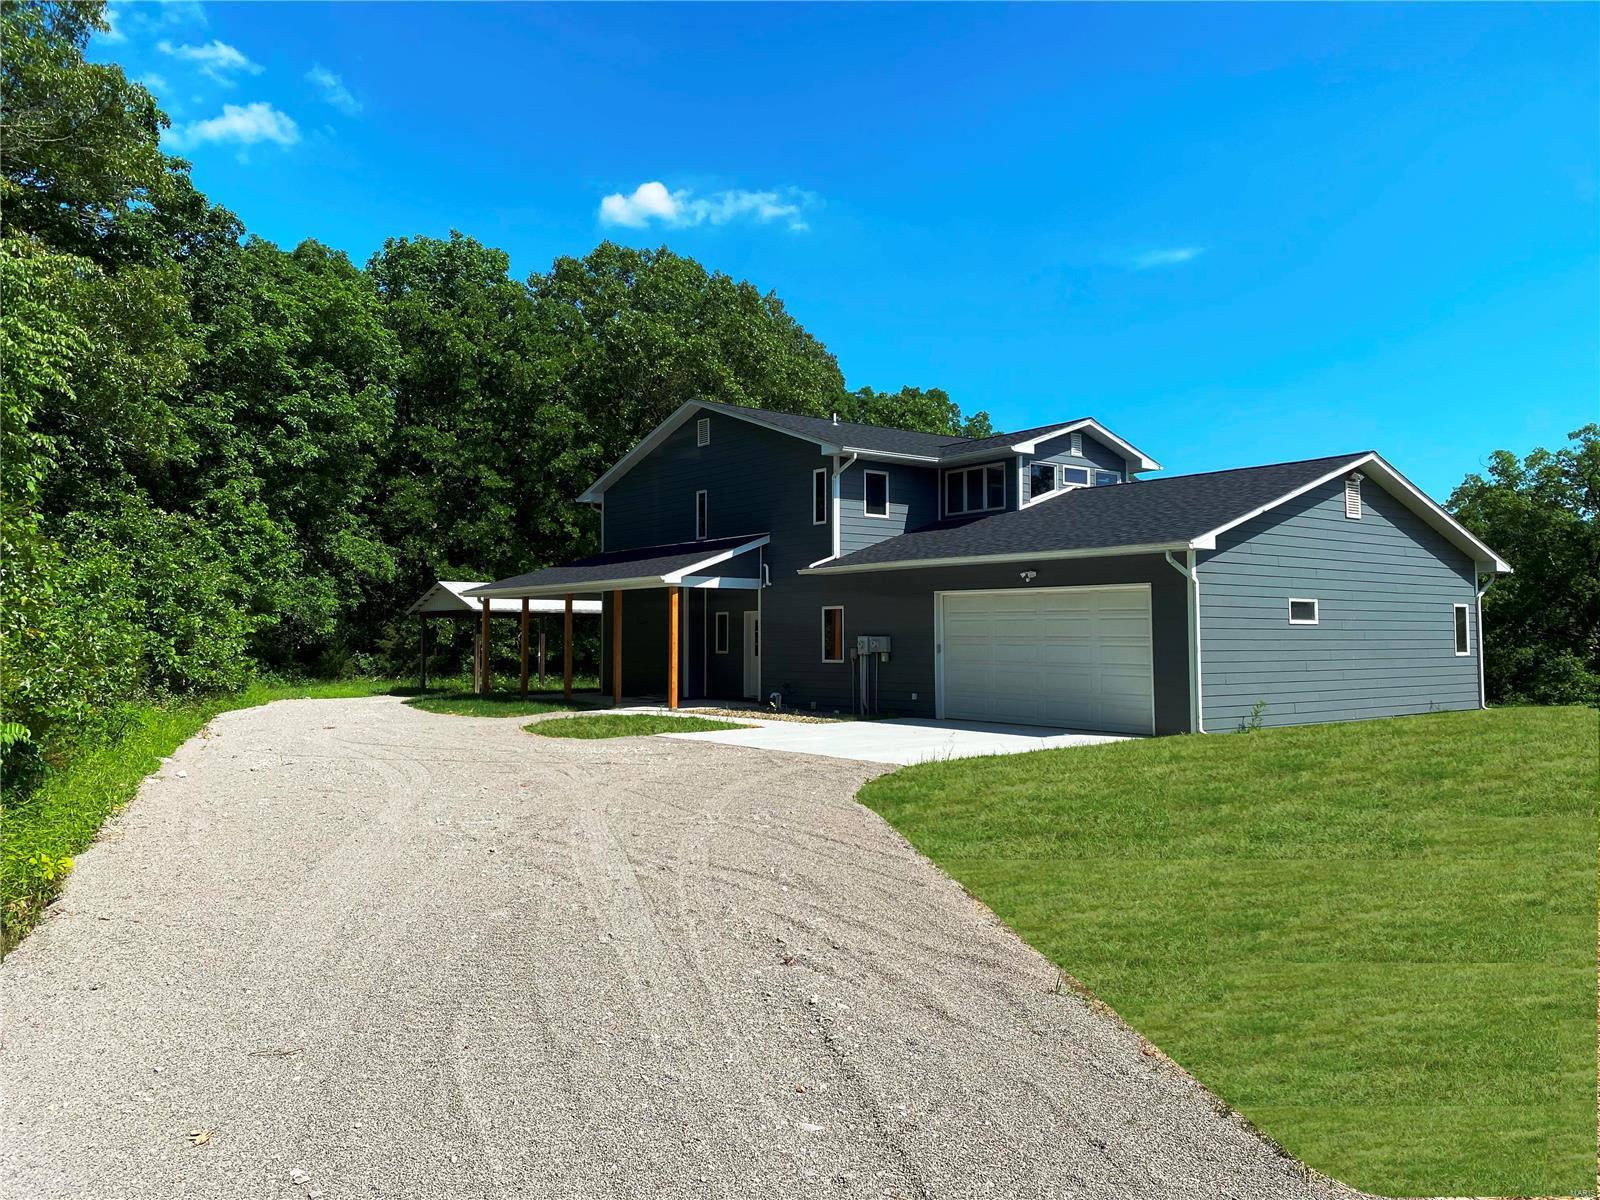 20750 N Ponderosa Property Photo - Clark, MO real estate listing